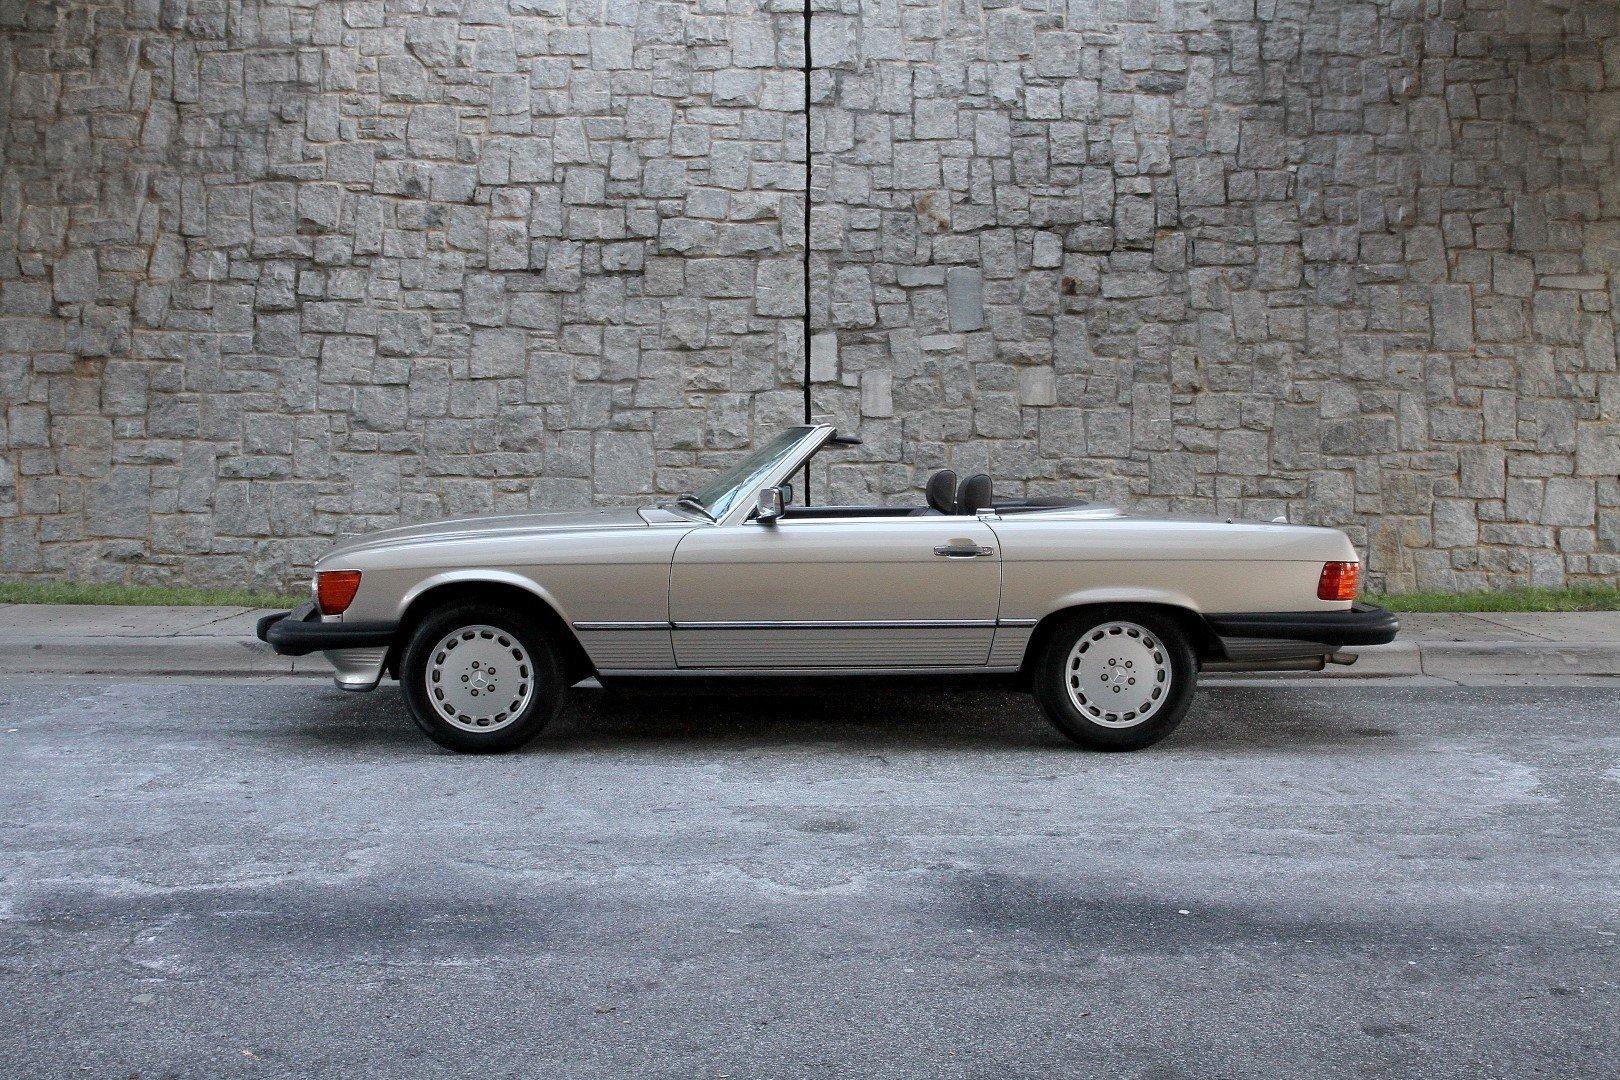 1988 mercedes benz 560 sl for sale 78510 mcg for Mercedes garage 93